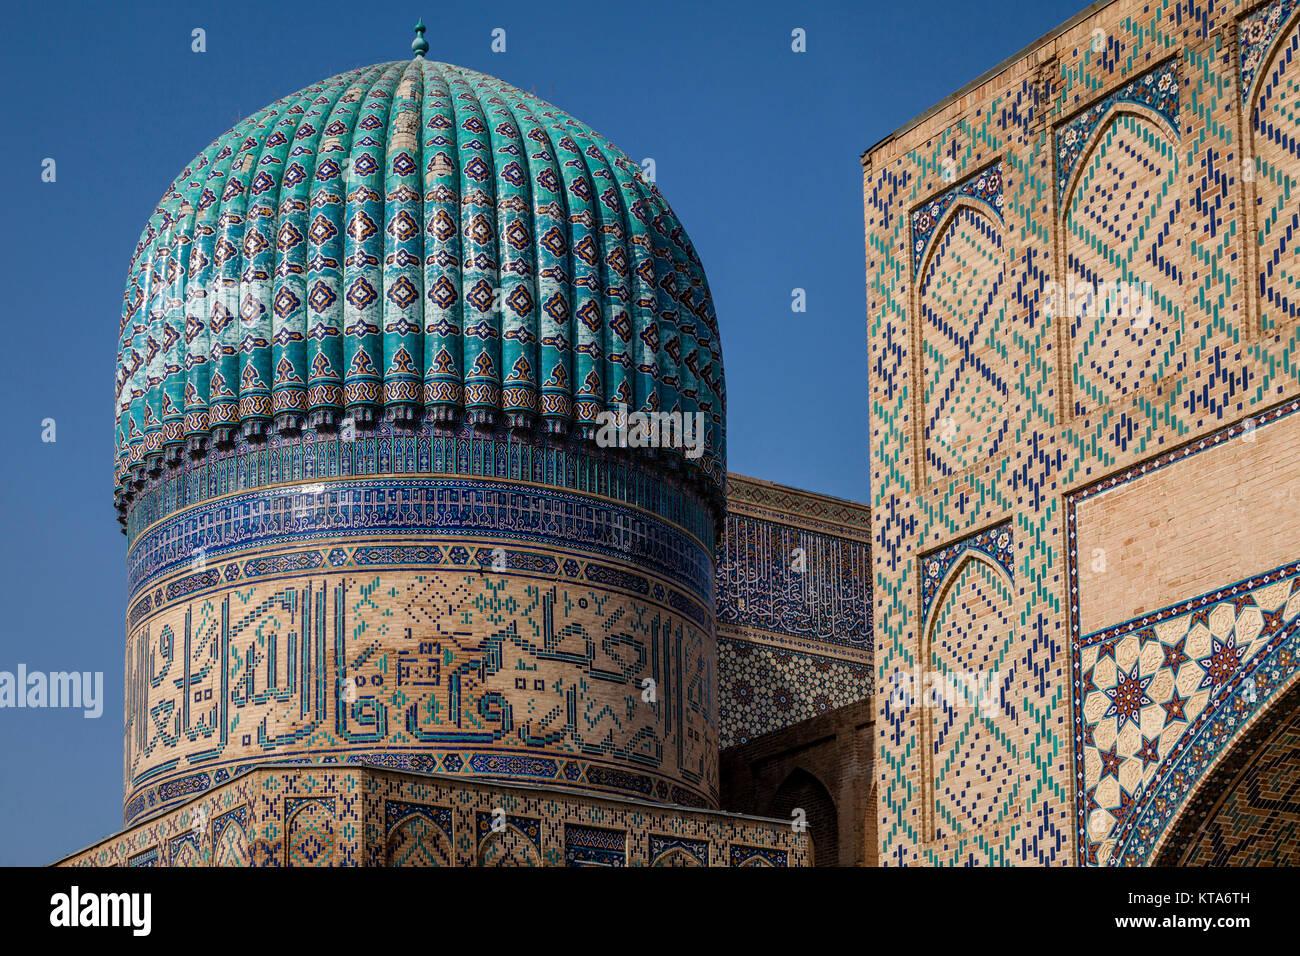 What Is A Mosque Detail: Samarkand Bibi Khanym Mosque Detail Stock Photos